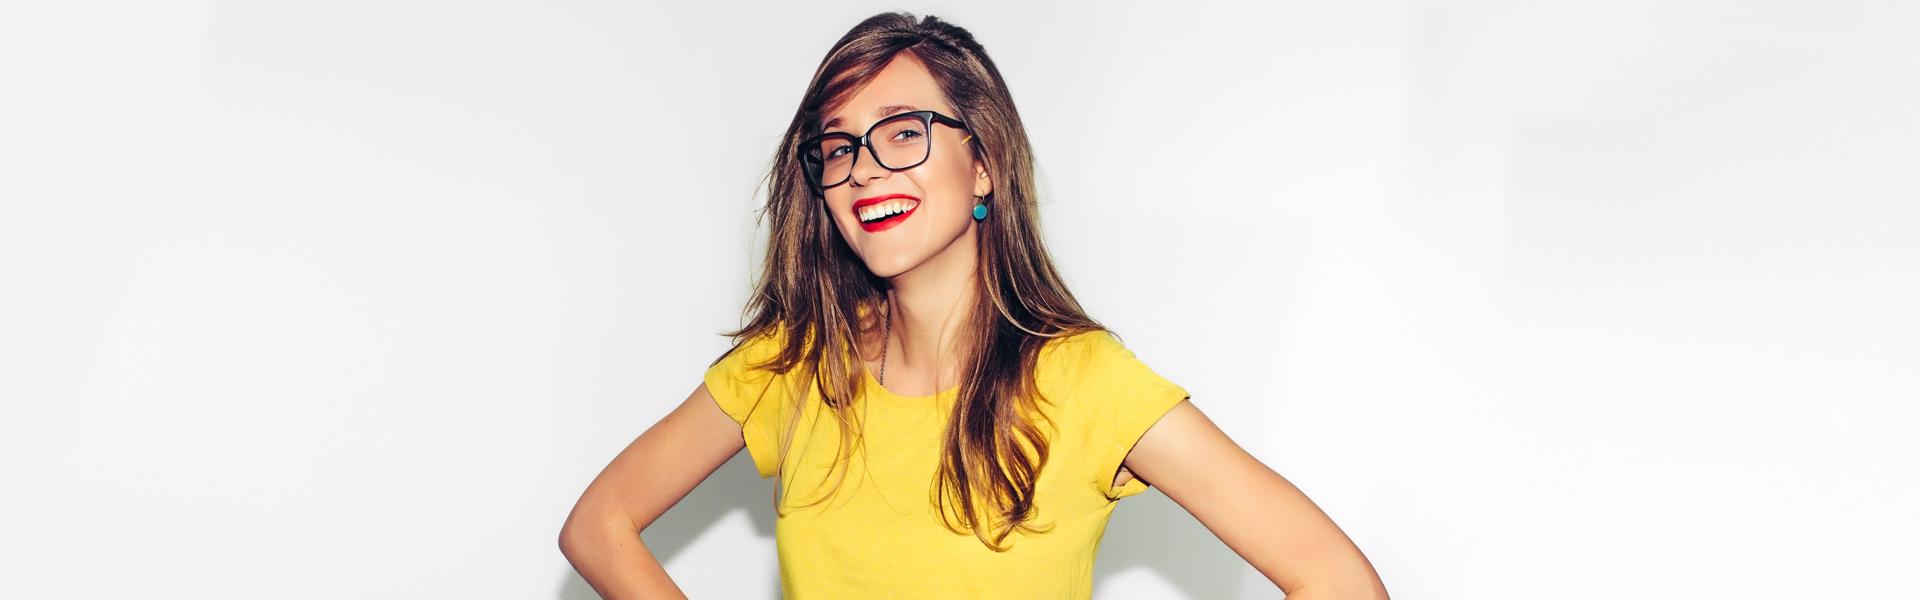 Teeth Whitening FAQ You Must Know